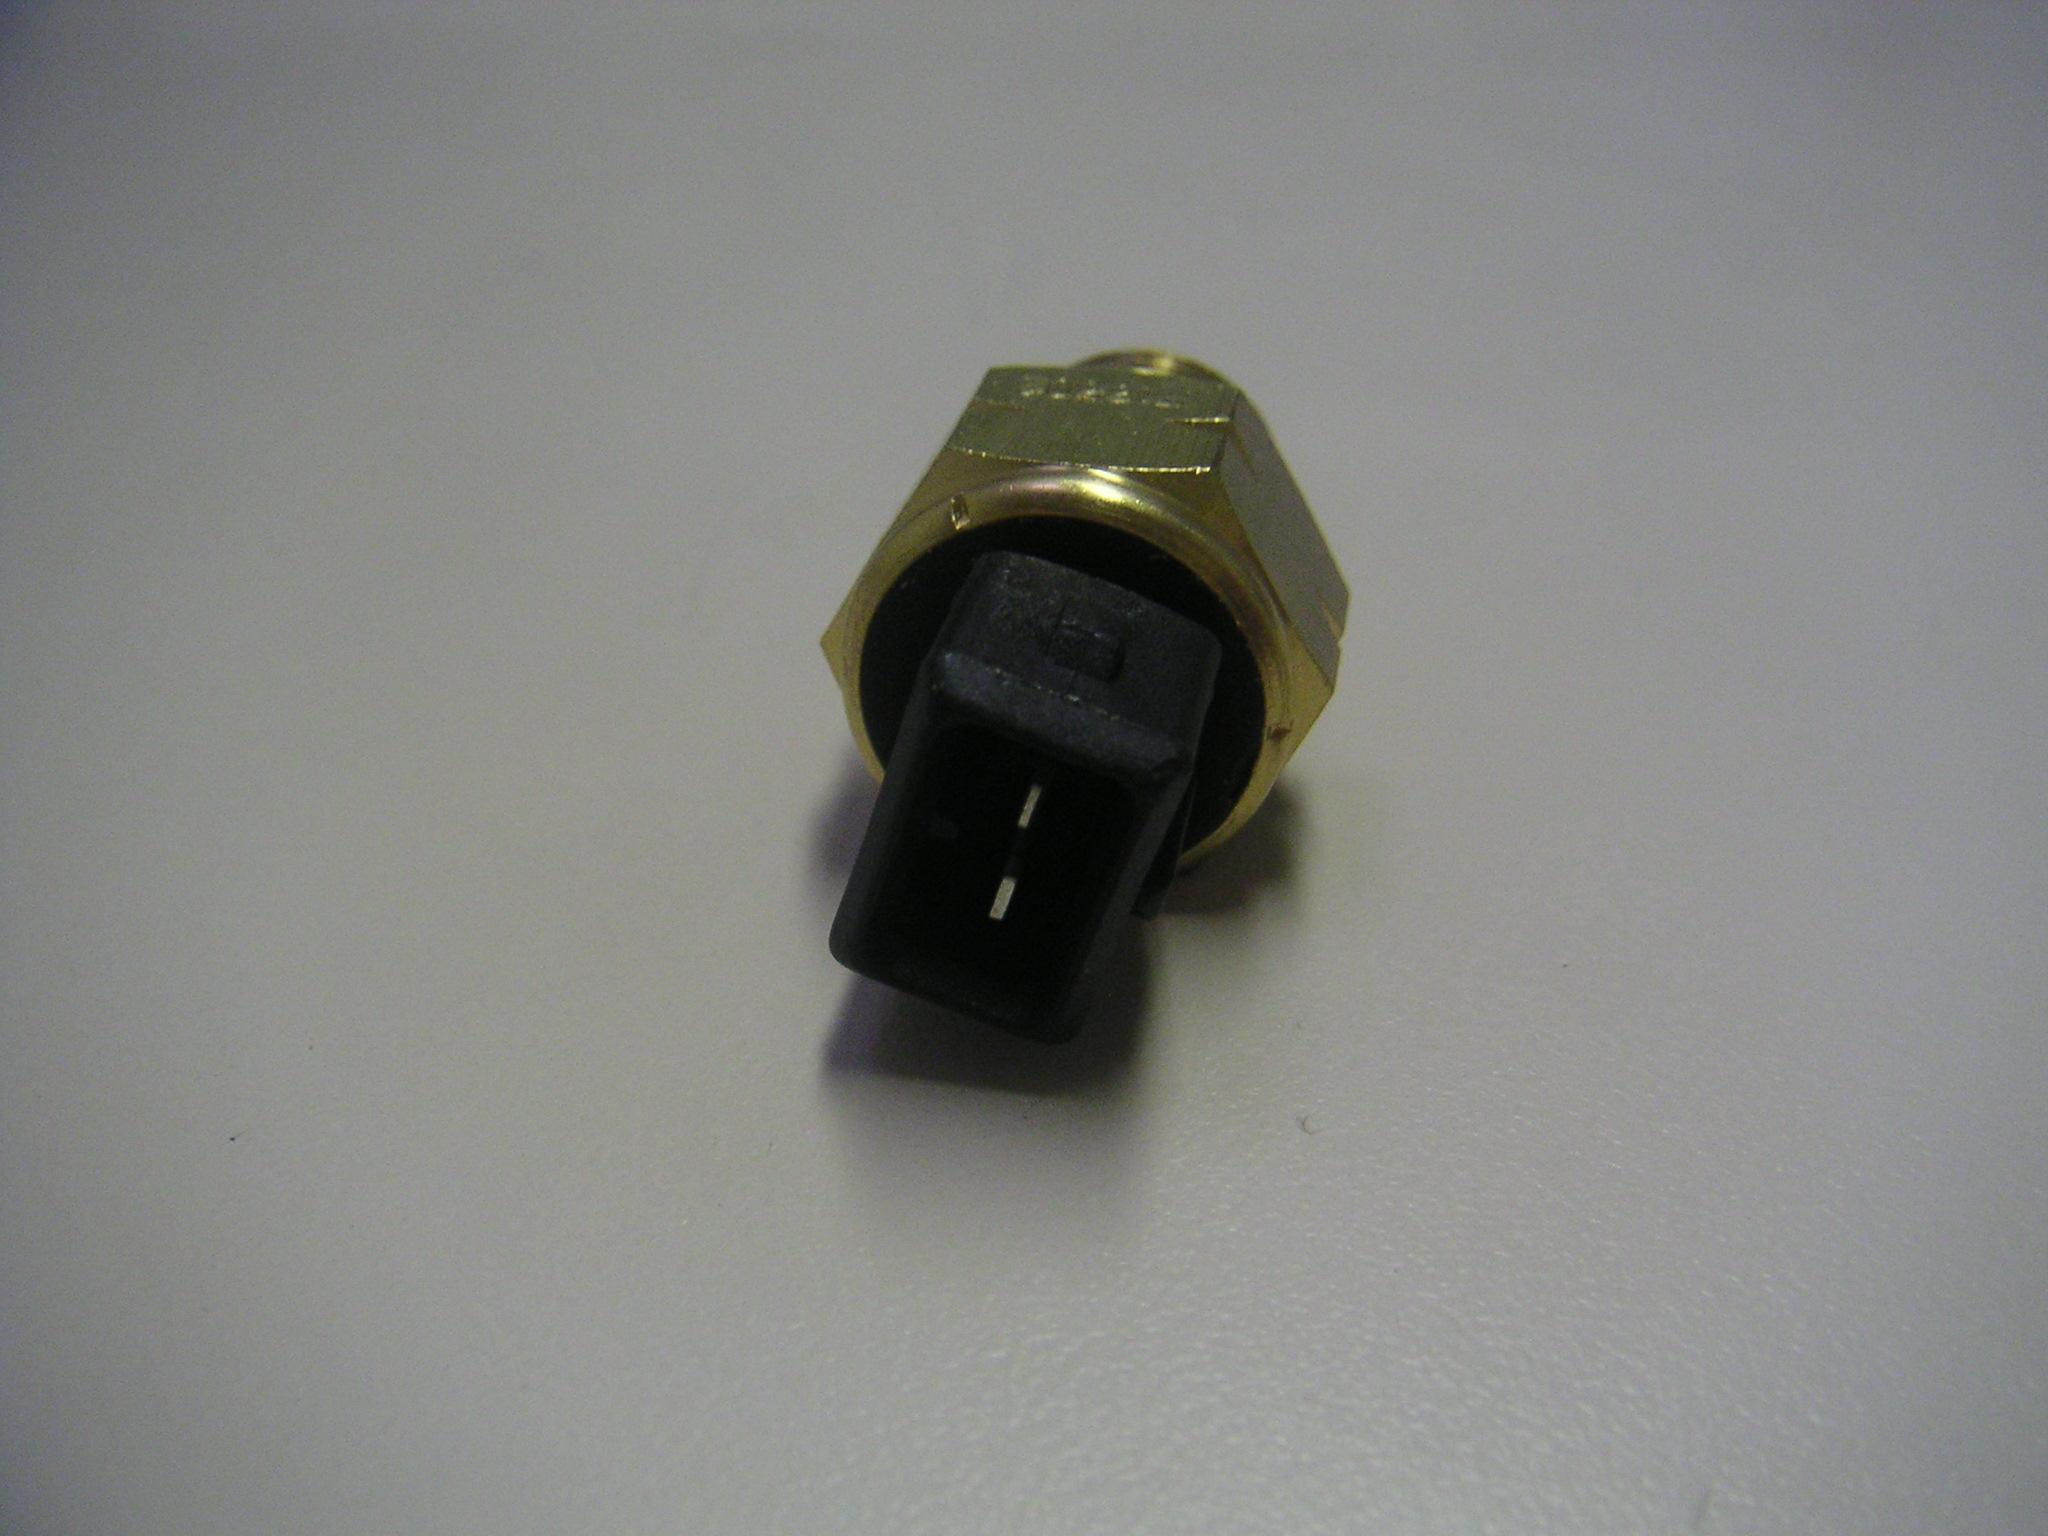 Sonde Temperature eau LDW502 LDW602 LDW702 LDW903 LDW1003 LDW1204 LDW1404 FOCS LOMBARDINI Ø16 ED0091951080-S